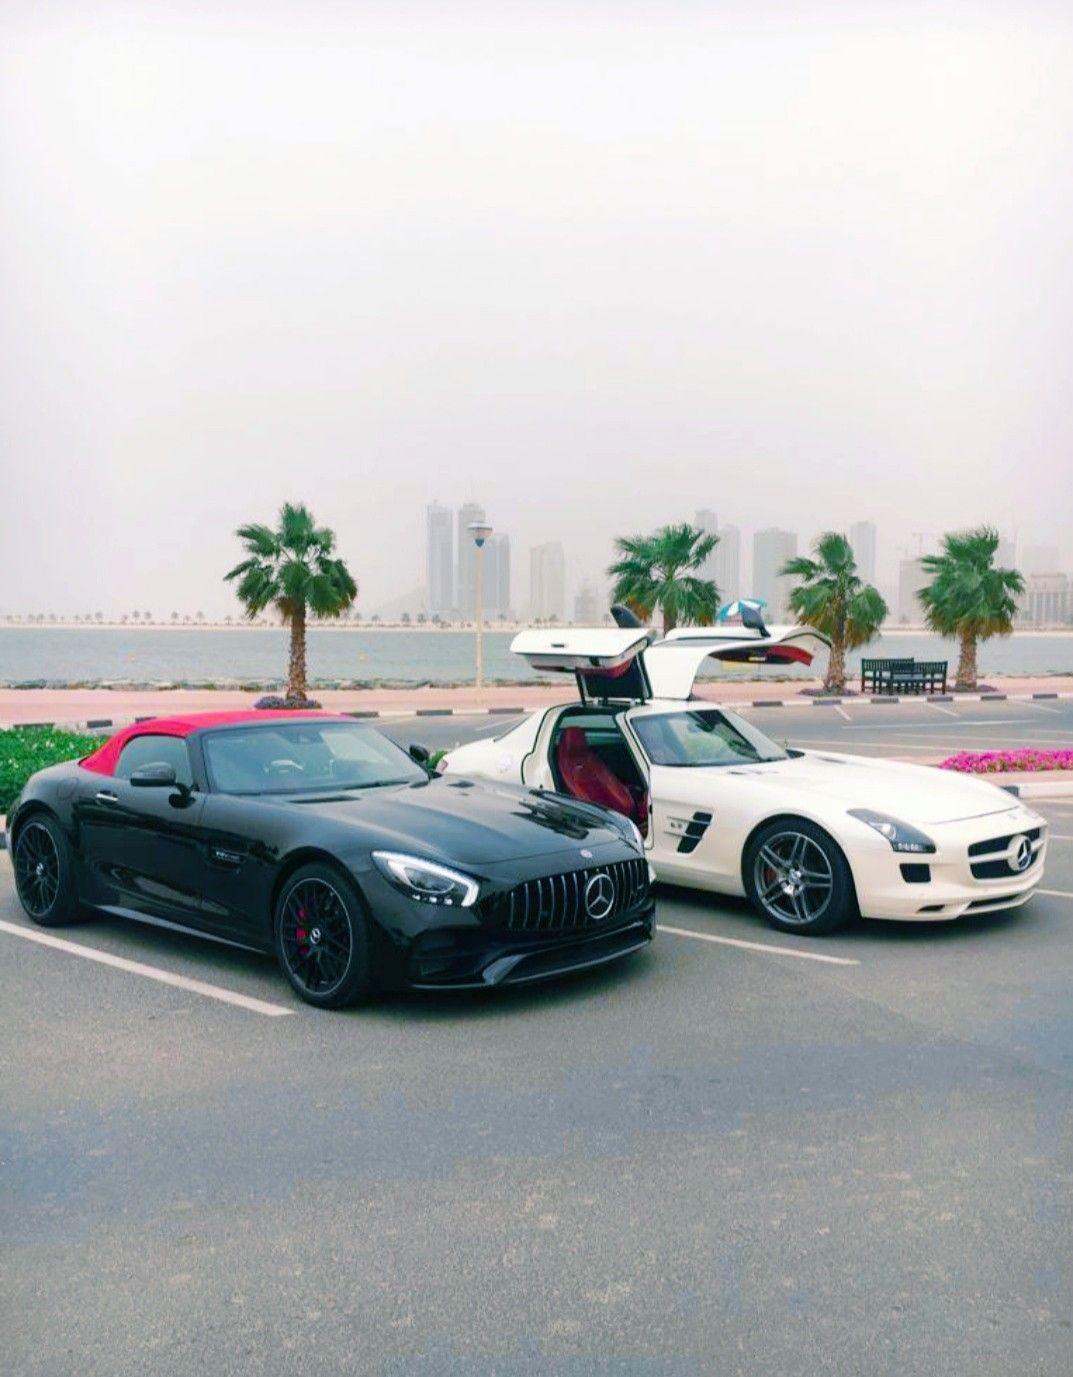 Mercedes Amg Gtc Roadster Mercedes Amg Sls In 2020 Luxury Car Rental Super Cars Car Rental